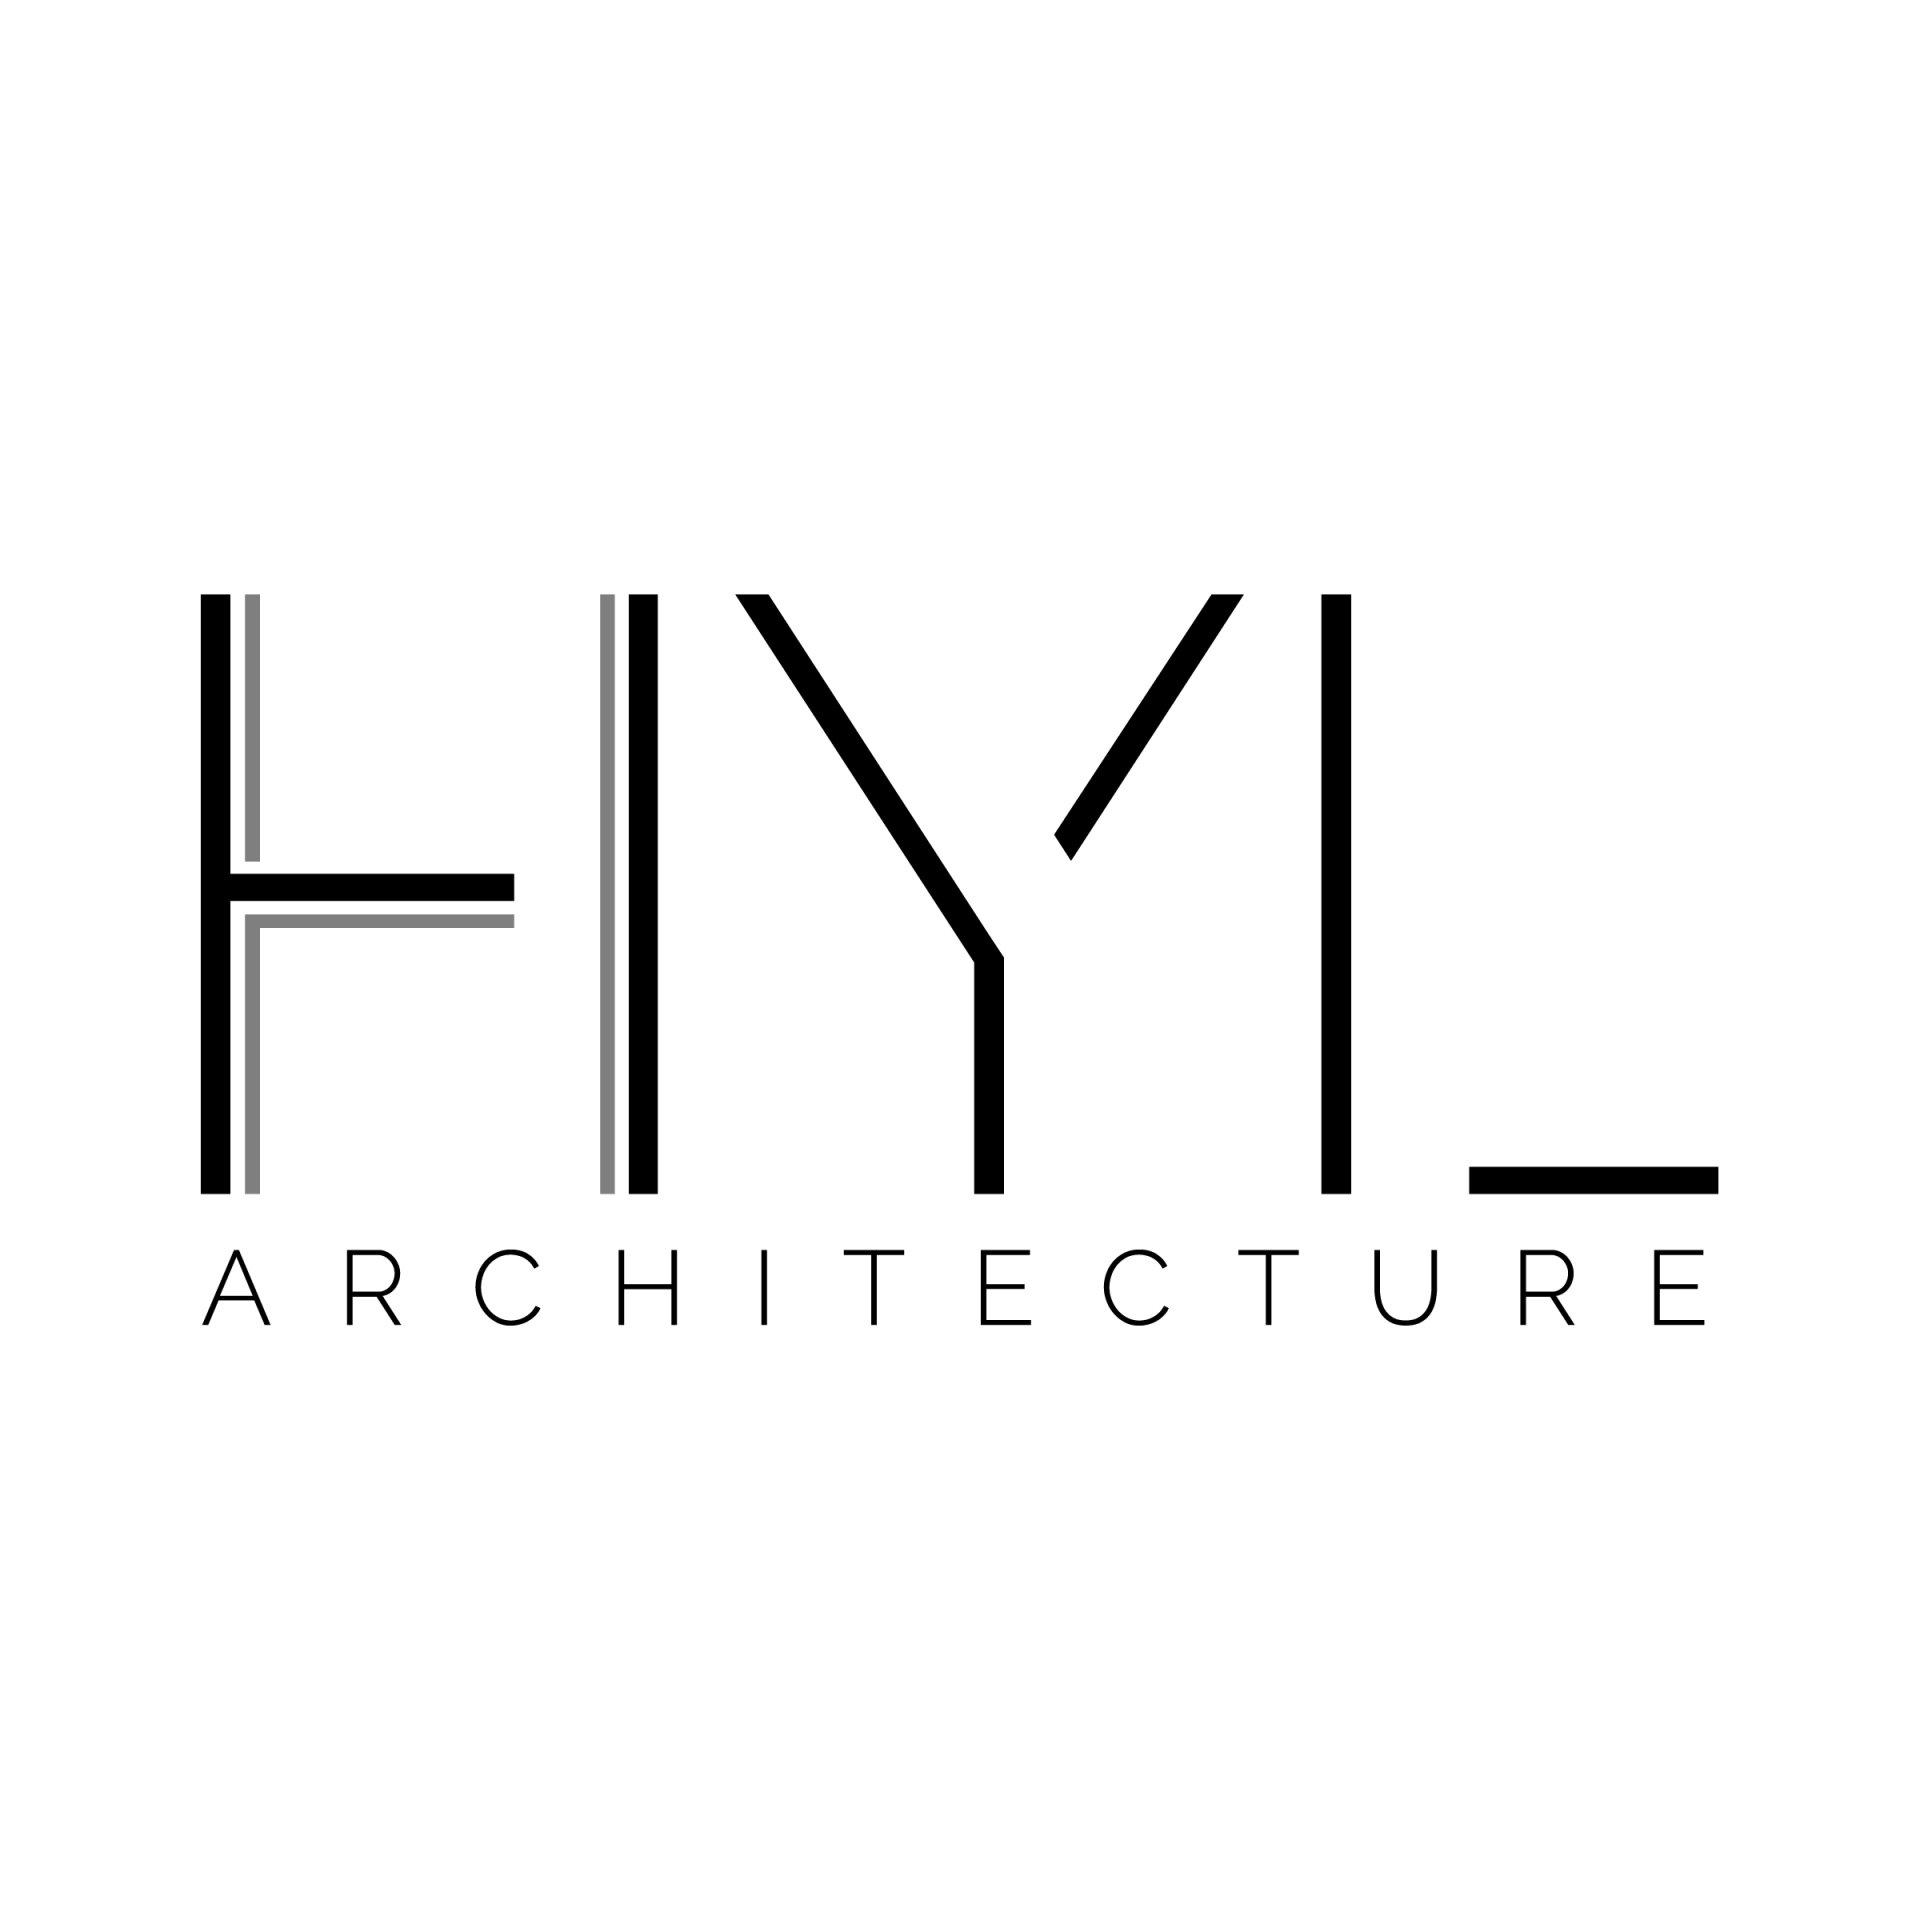 HYL+LOGO+-+2018.jpg